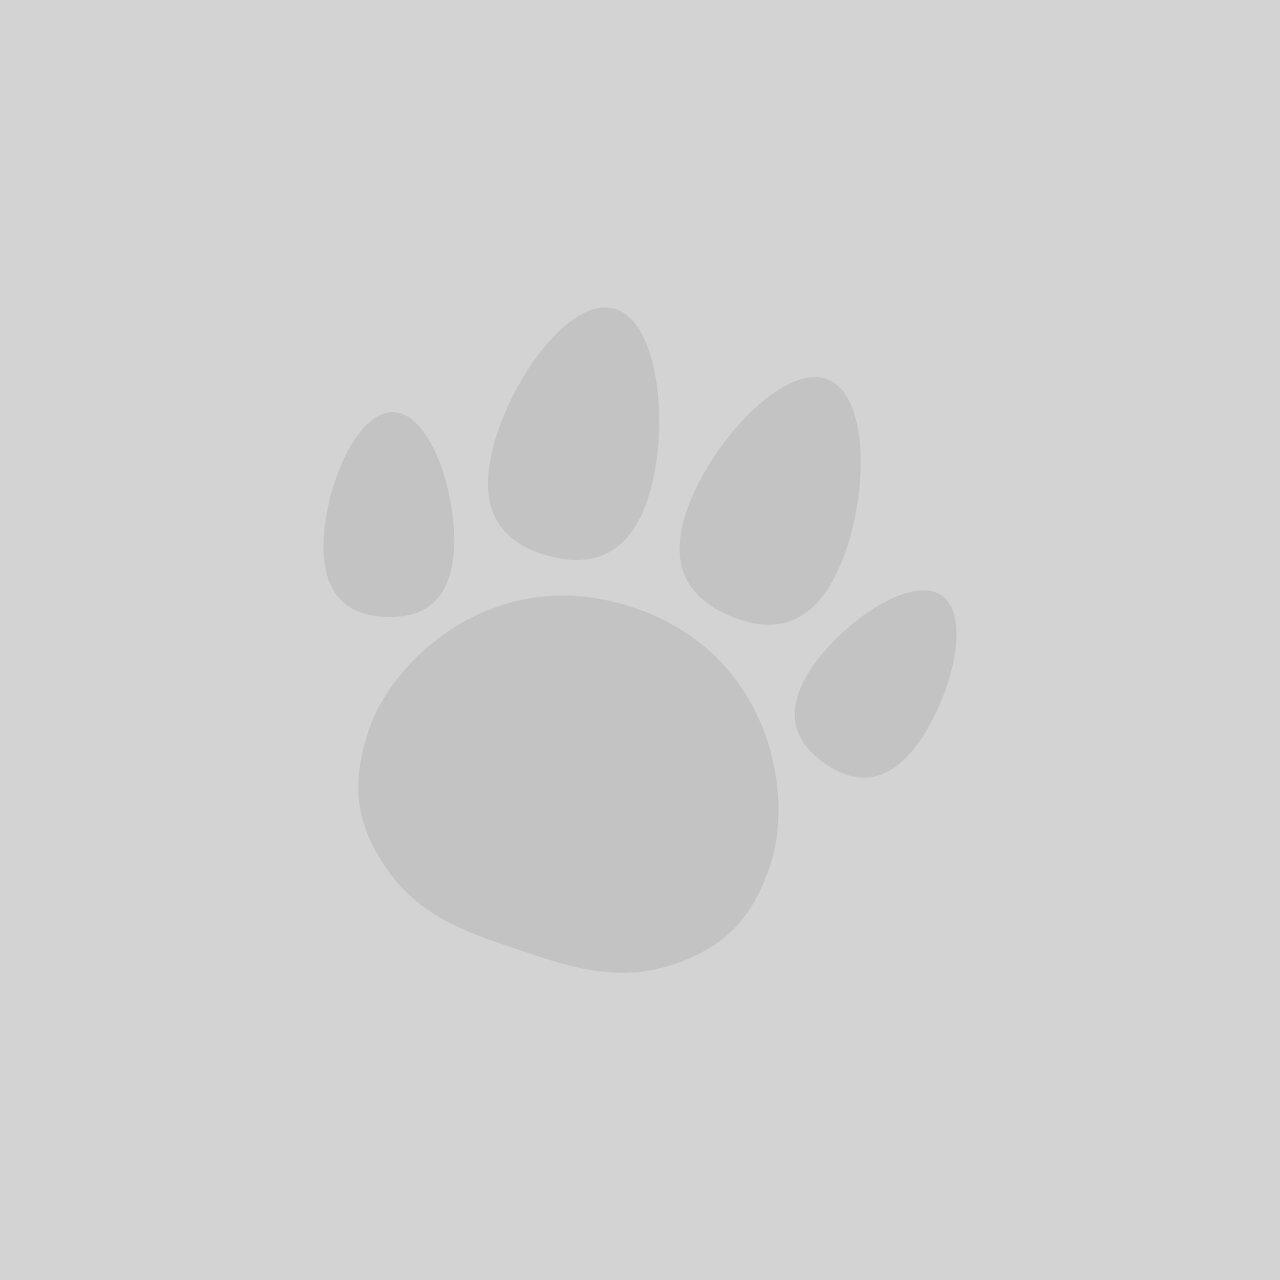 Danish Design LumberJack Red & Grey Deluxe Slumber Dog Bed (Size Options)